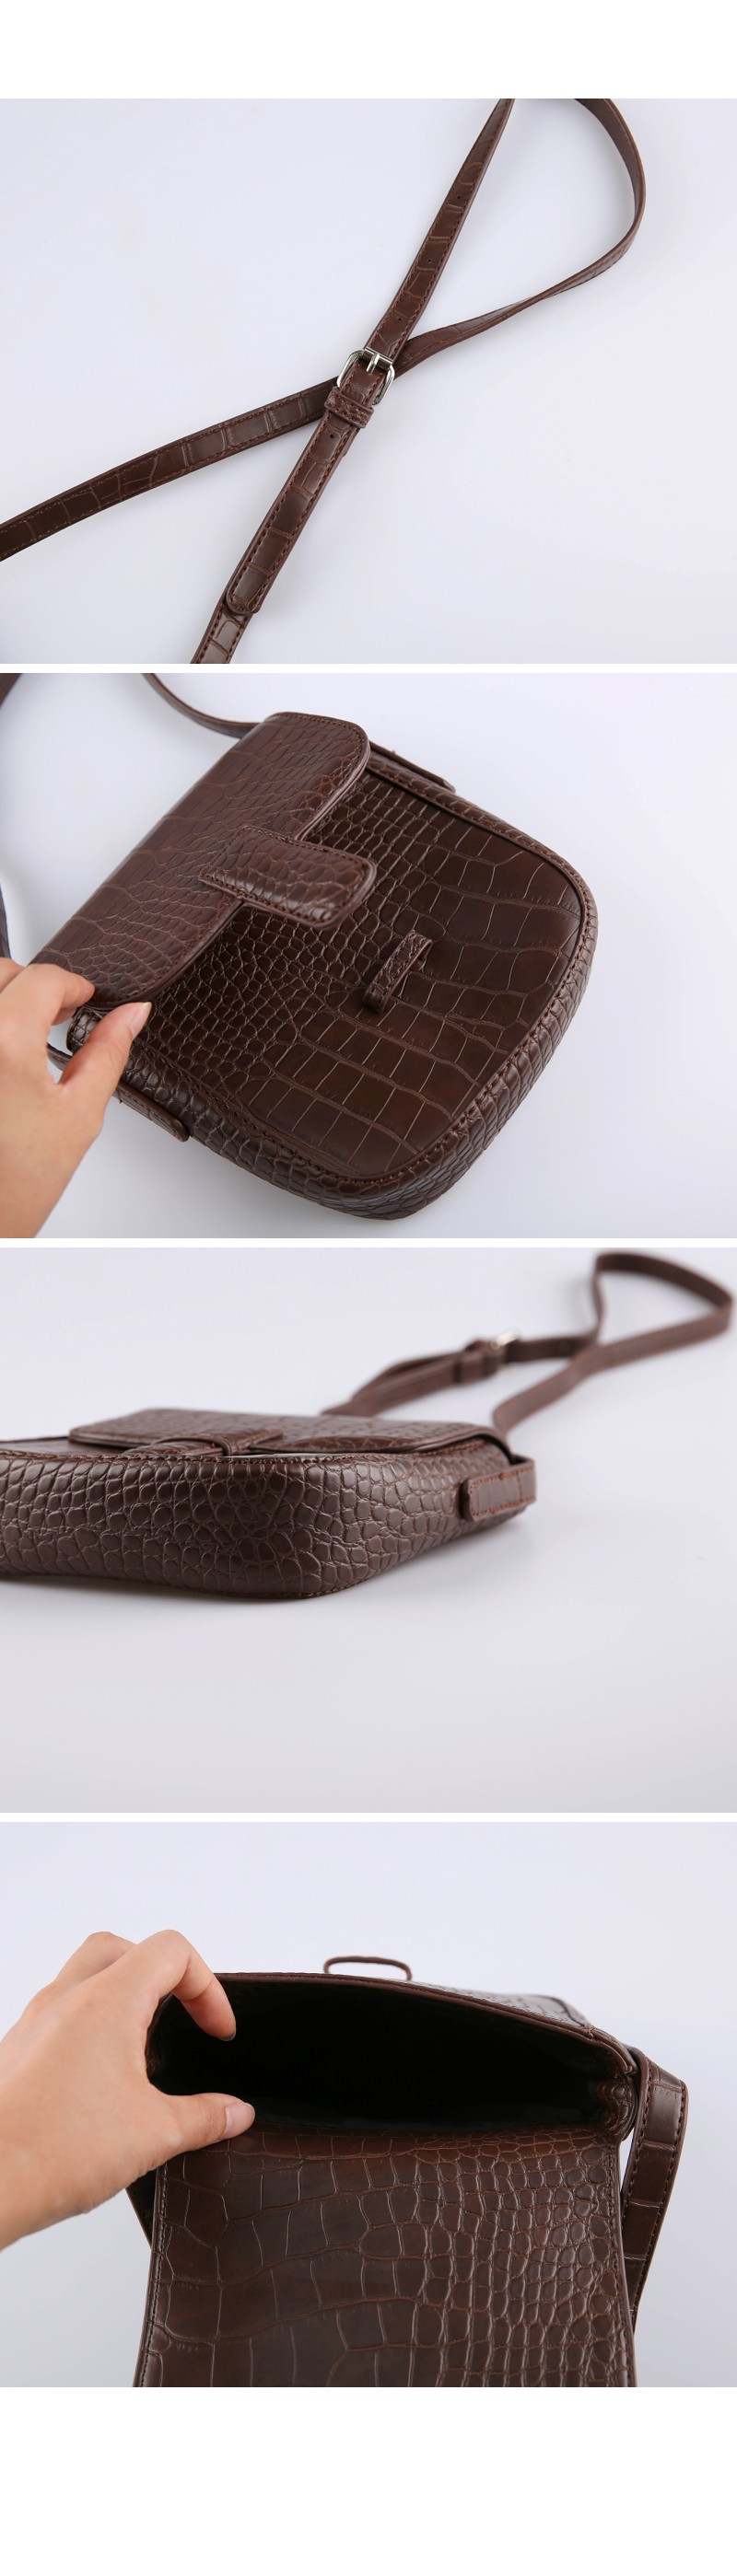 Crack leather cross bag